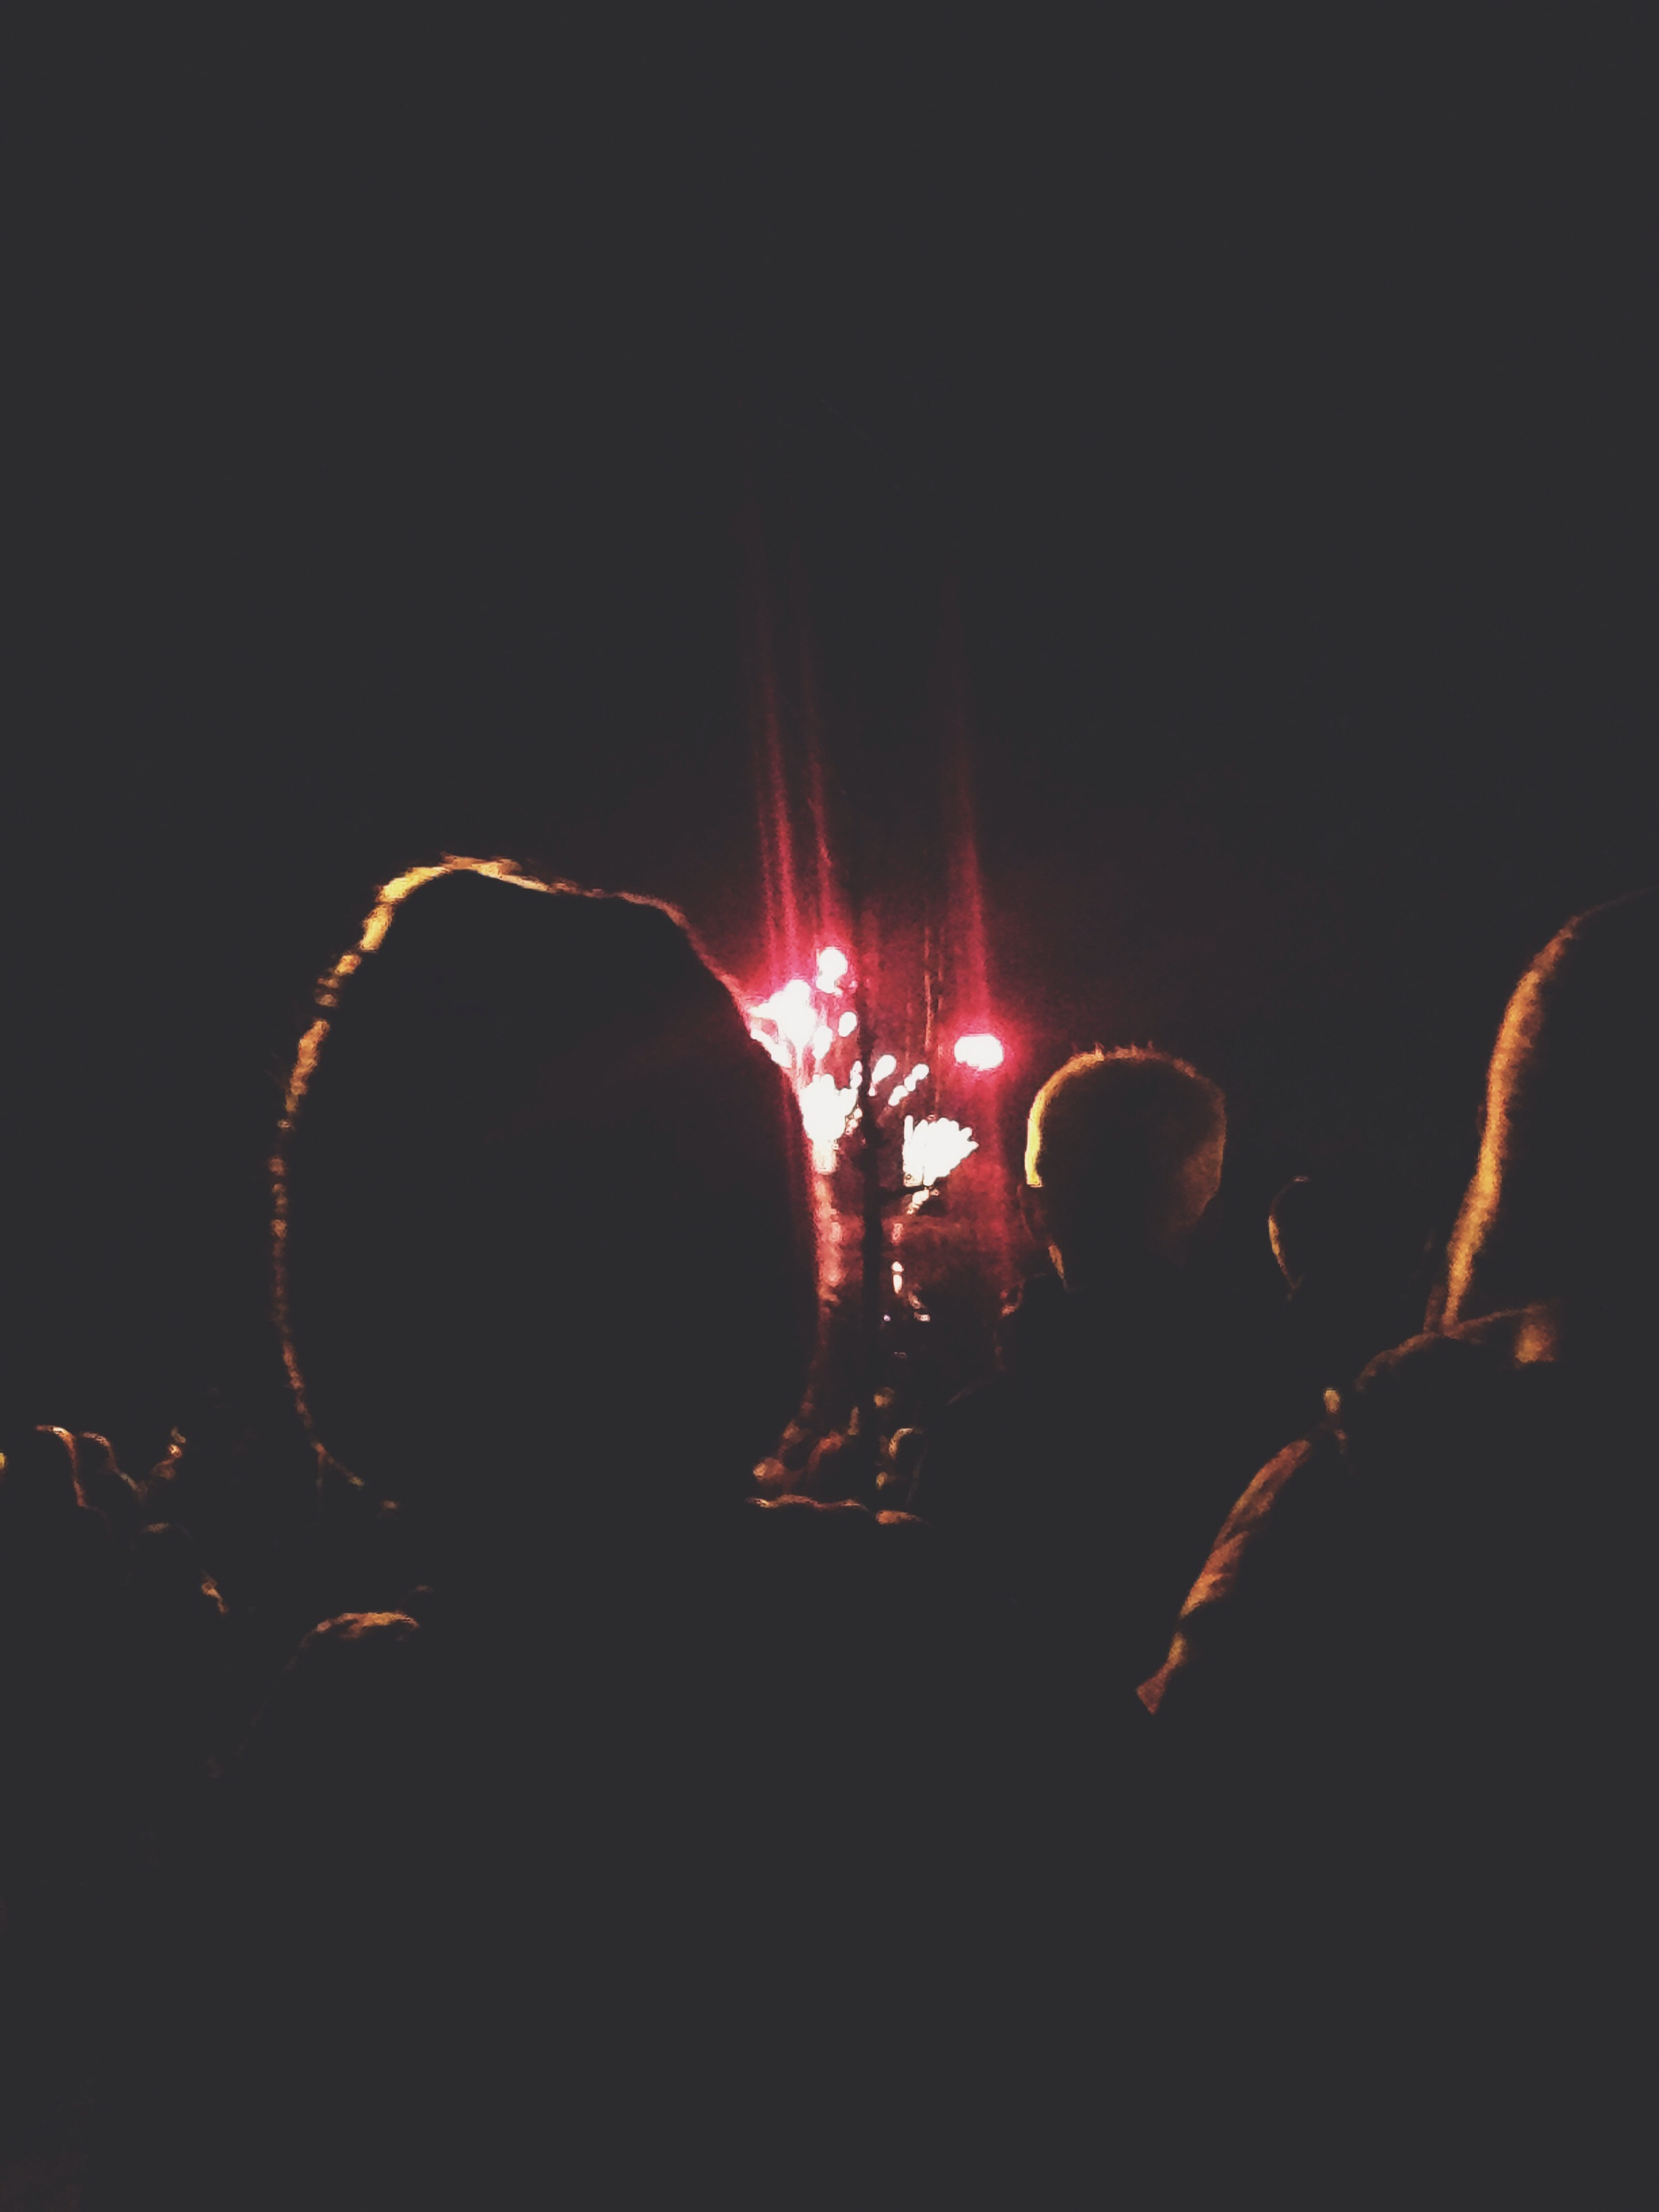 Craigavon Lakes Fireworks